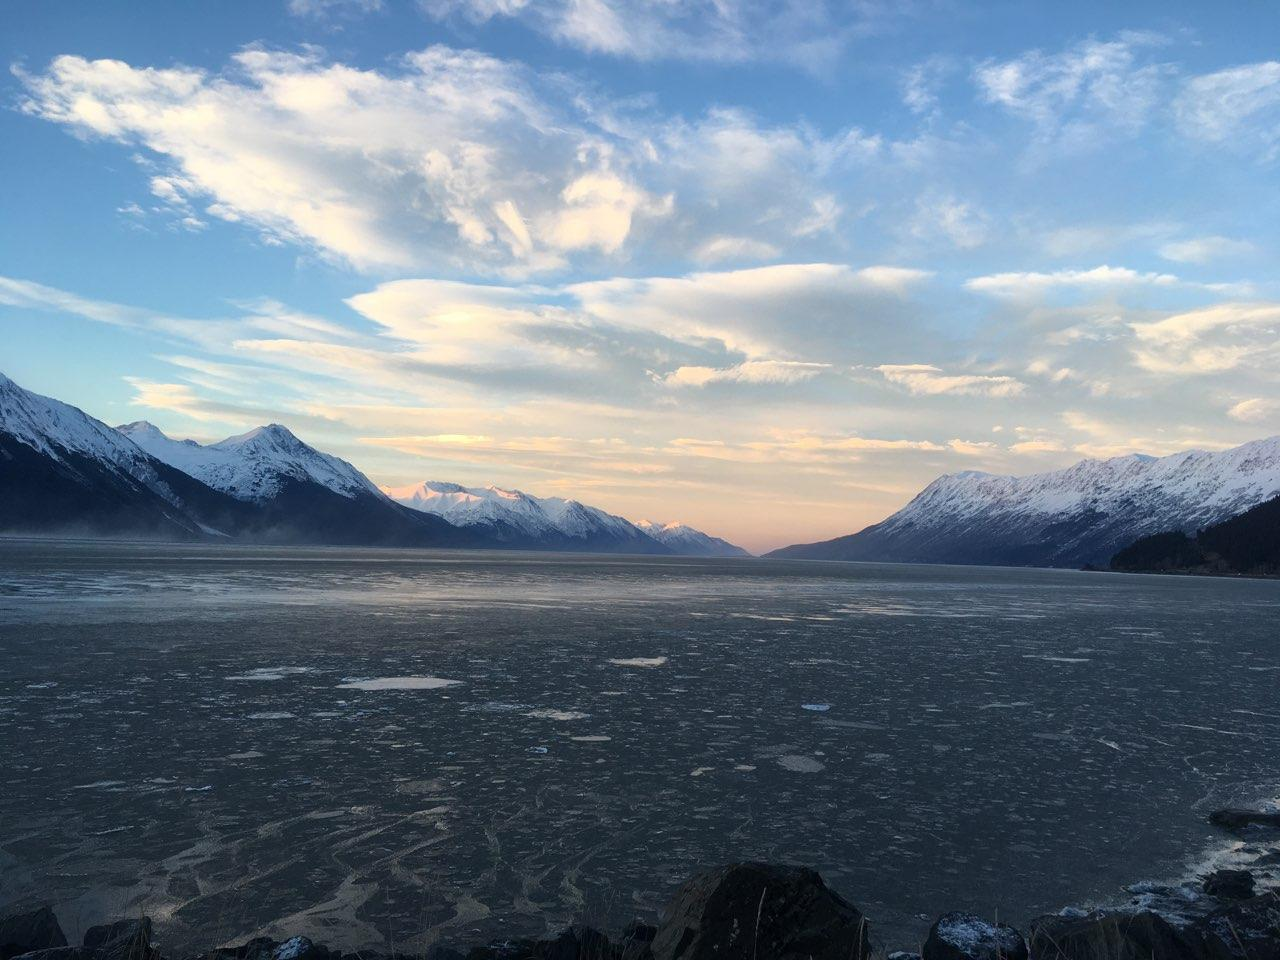 Turnagain Arm, Alaska. Image by Sonia Kumar